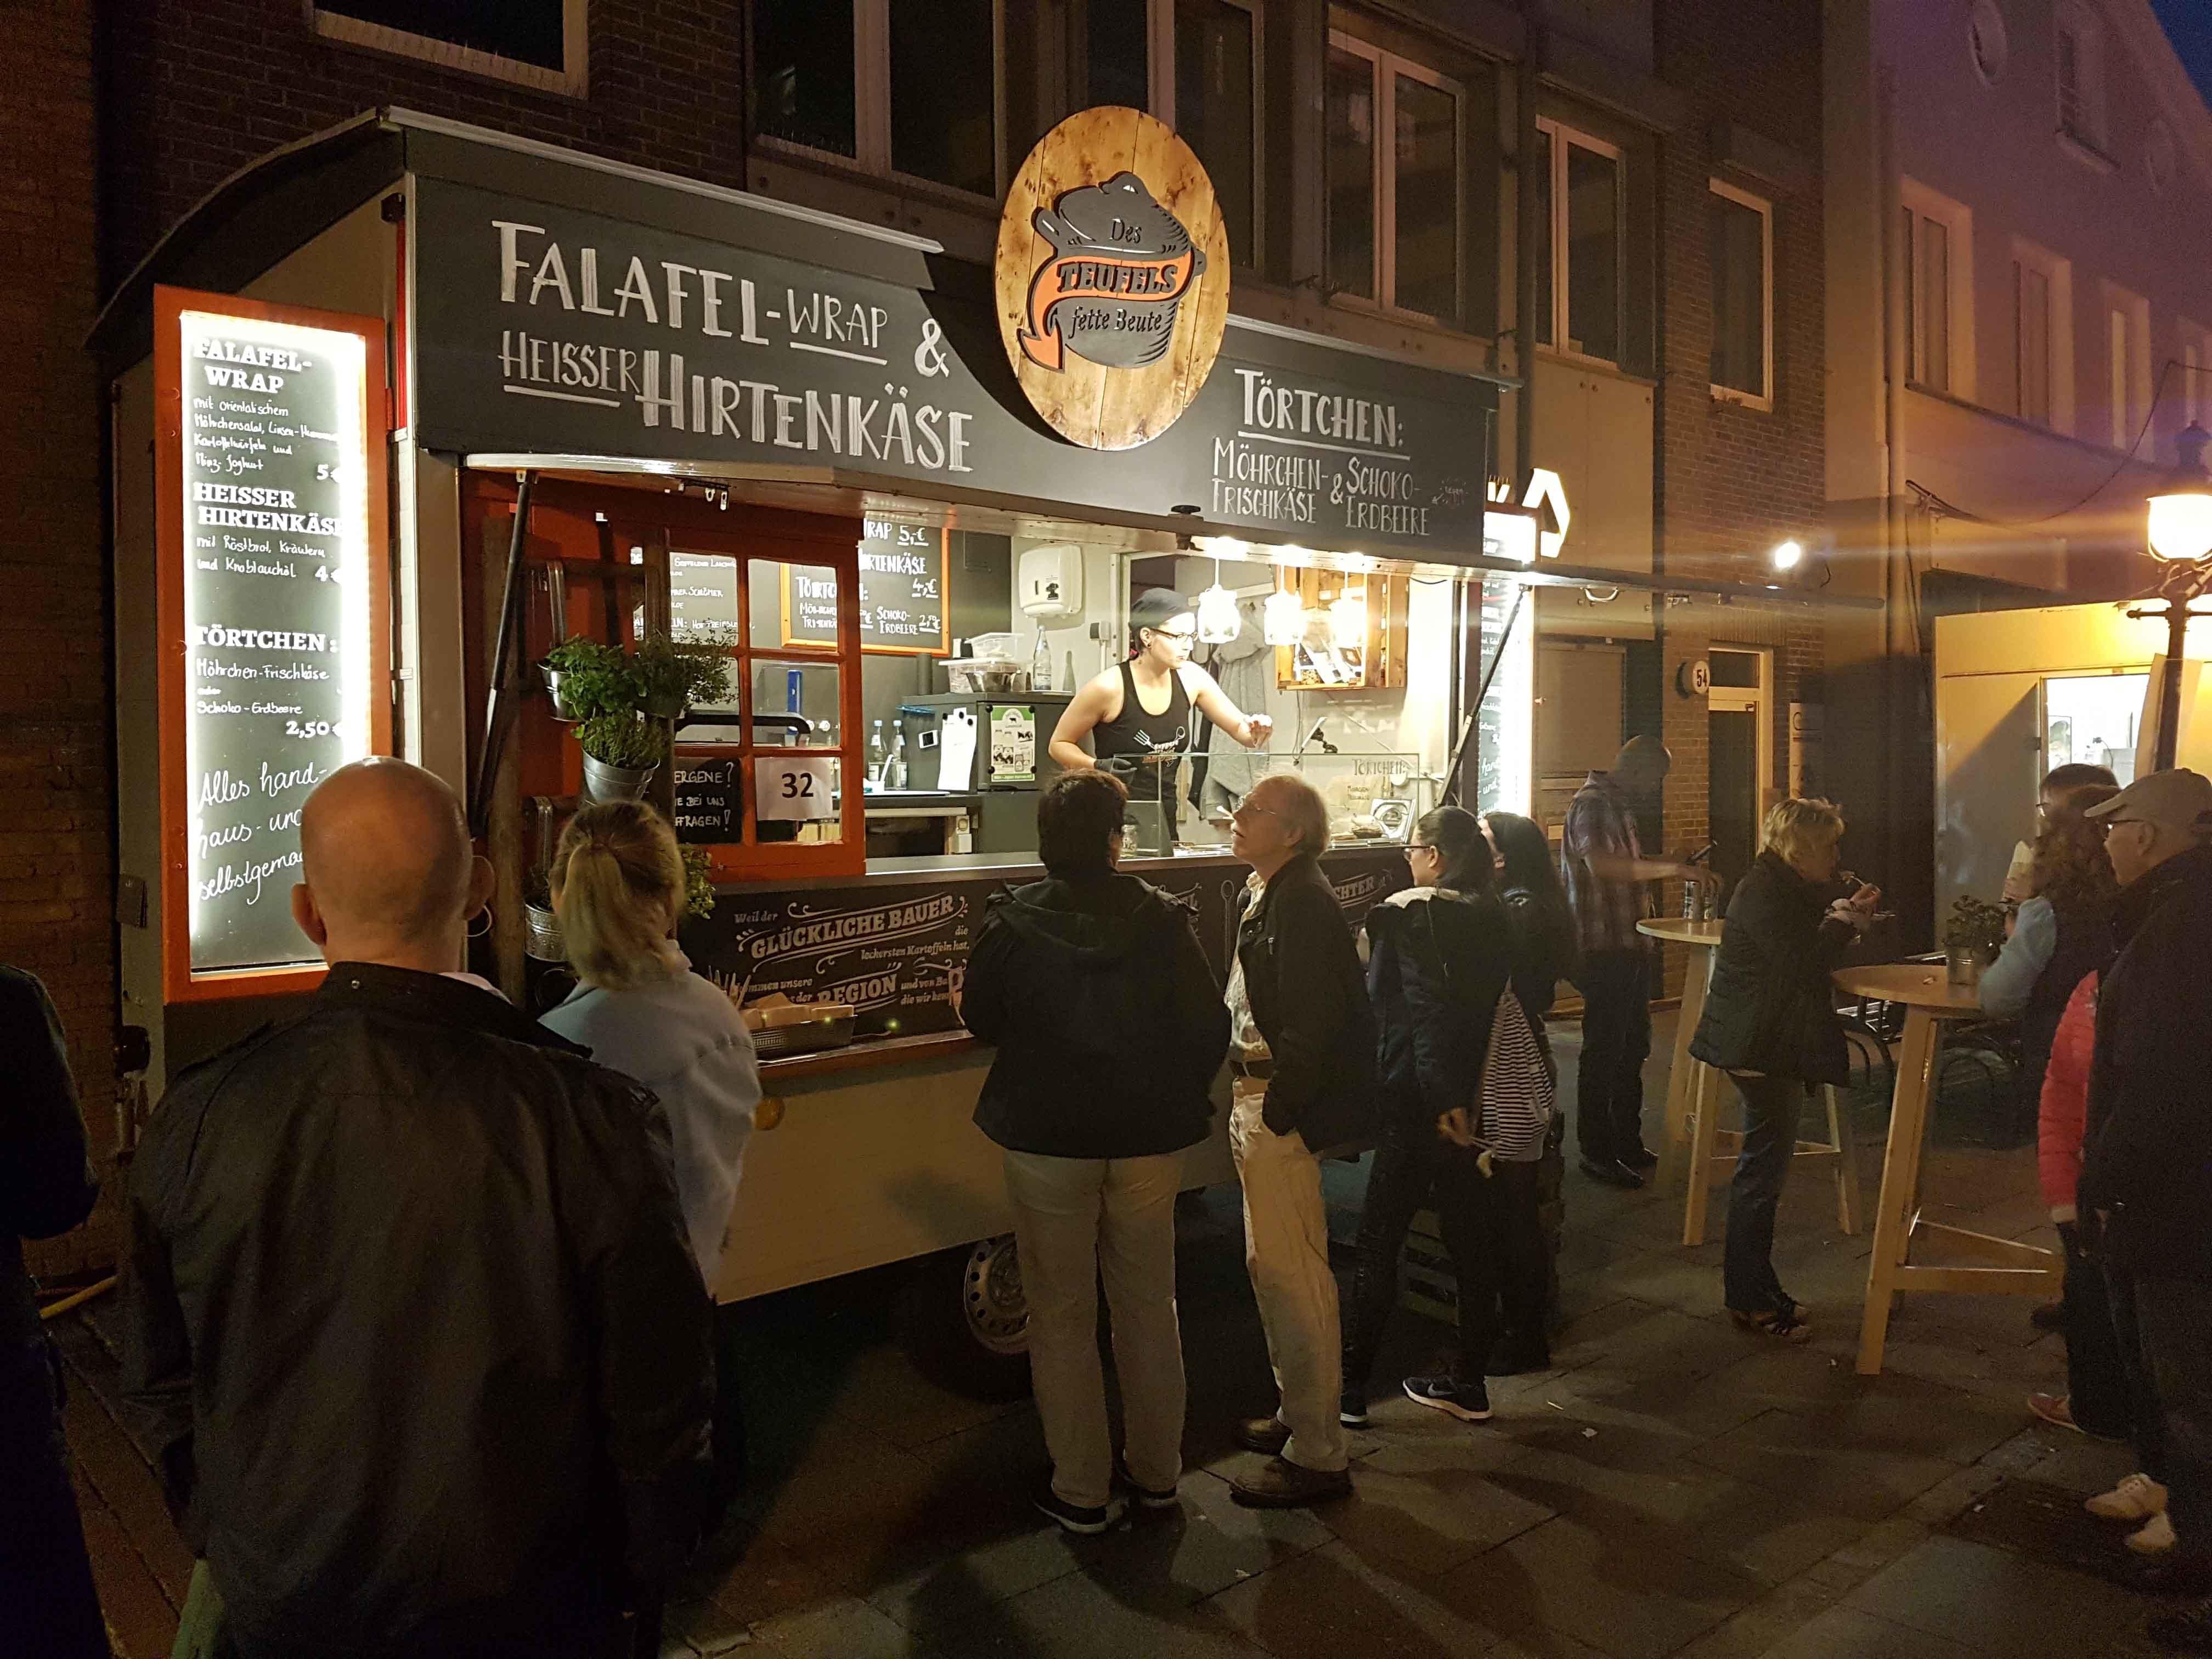 Szene Lokal Teufels Küche Feiert Wiedereröffnung | Neuigkeiten Zu Crowfdunding Projekten Auf Startnext